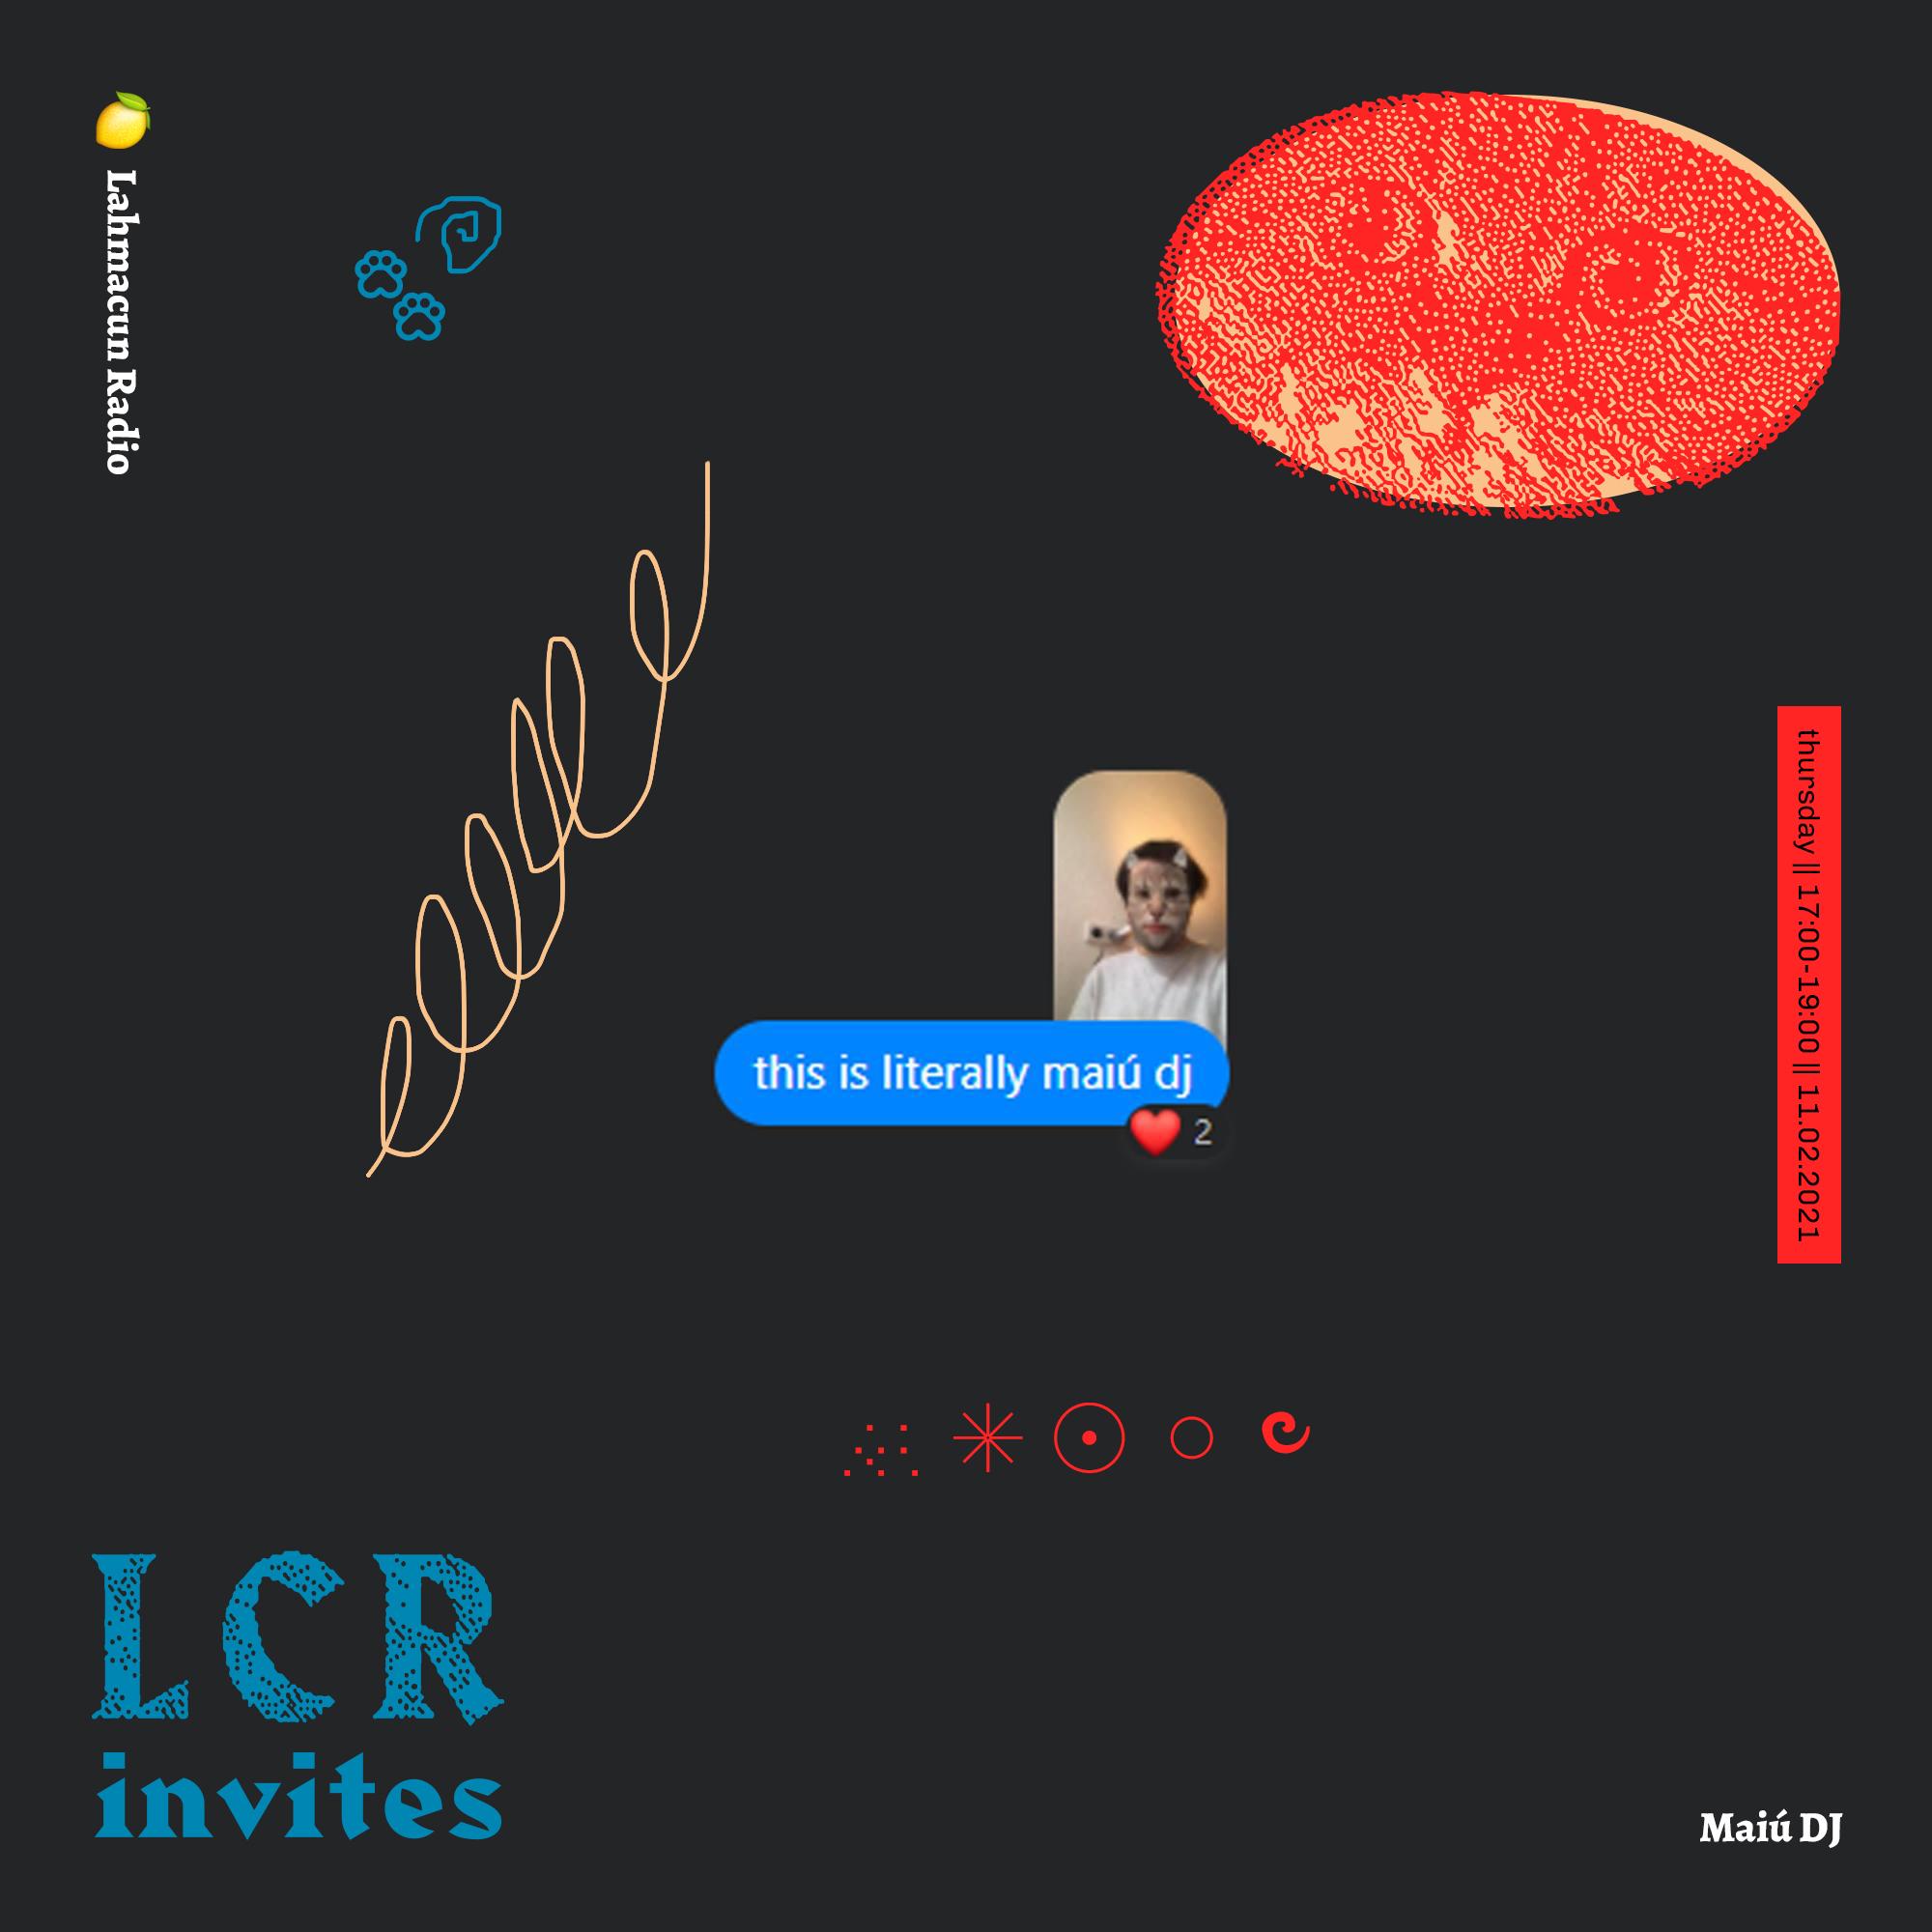 LCR Invites Maiú DJ